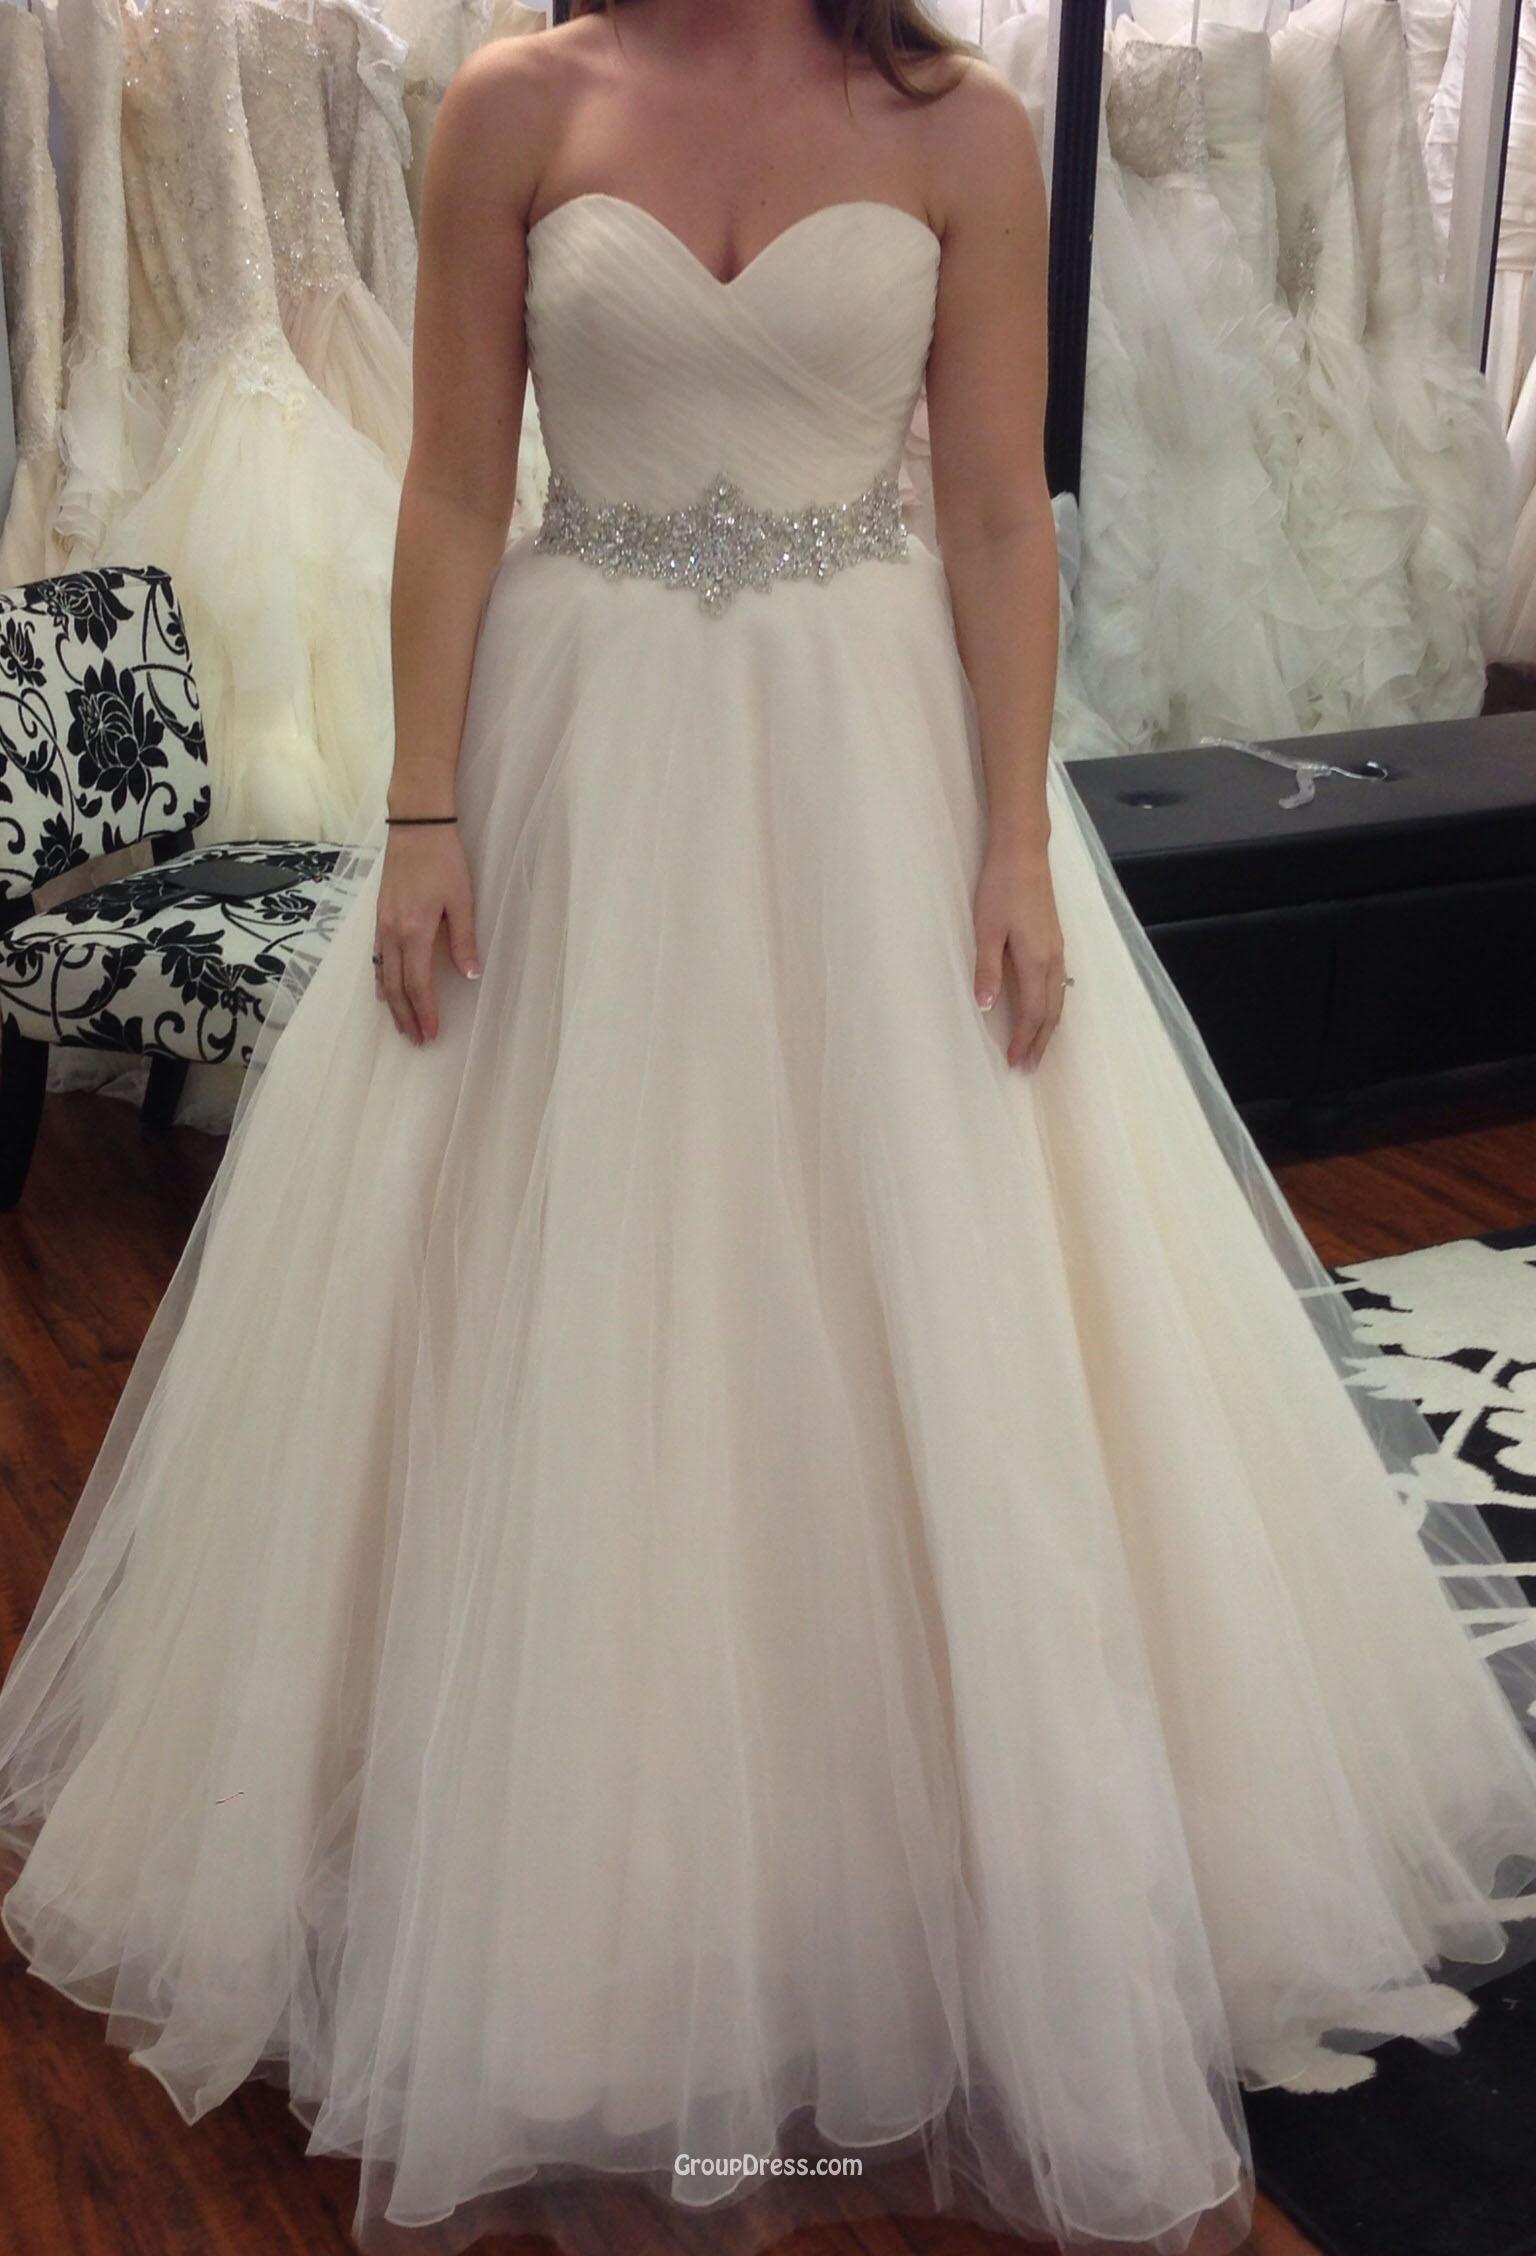 Wedding dresses ball gown sweetheart  Image result for wedding dresses ball gown  wedding  Pinterest